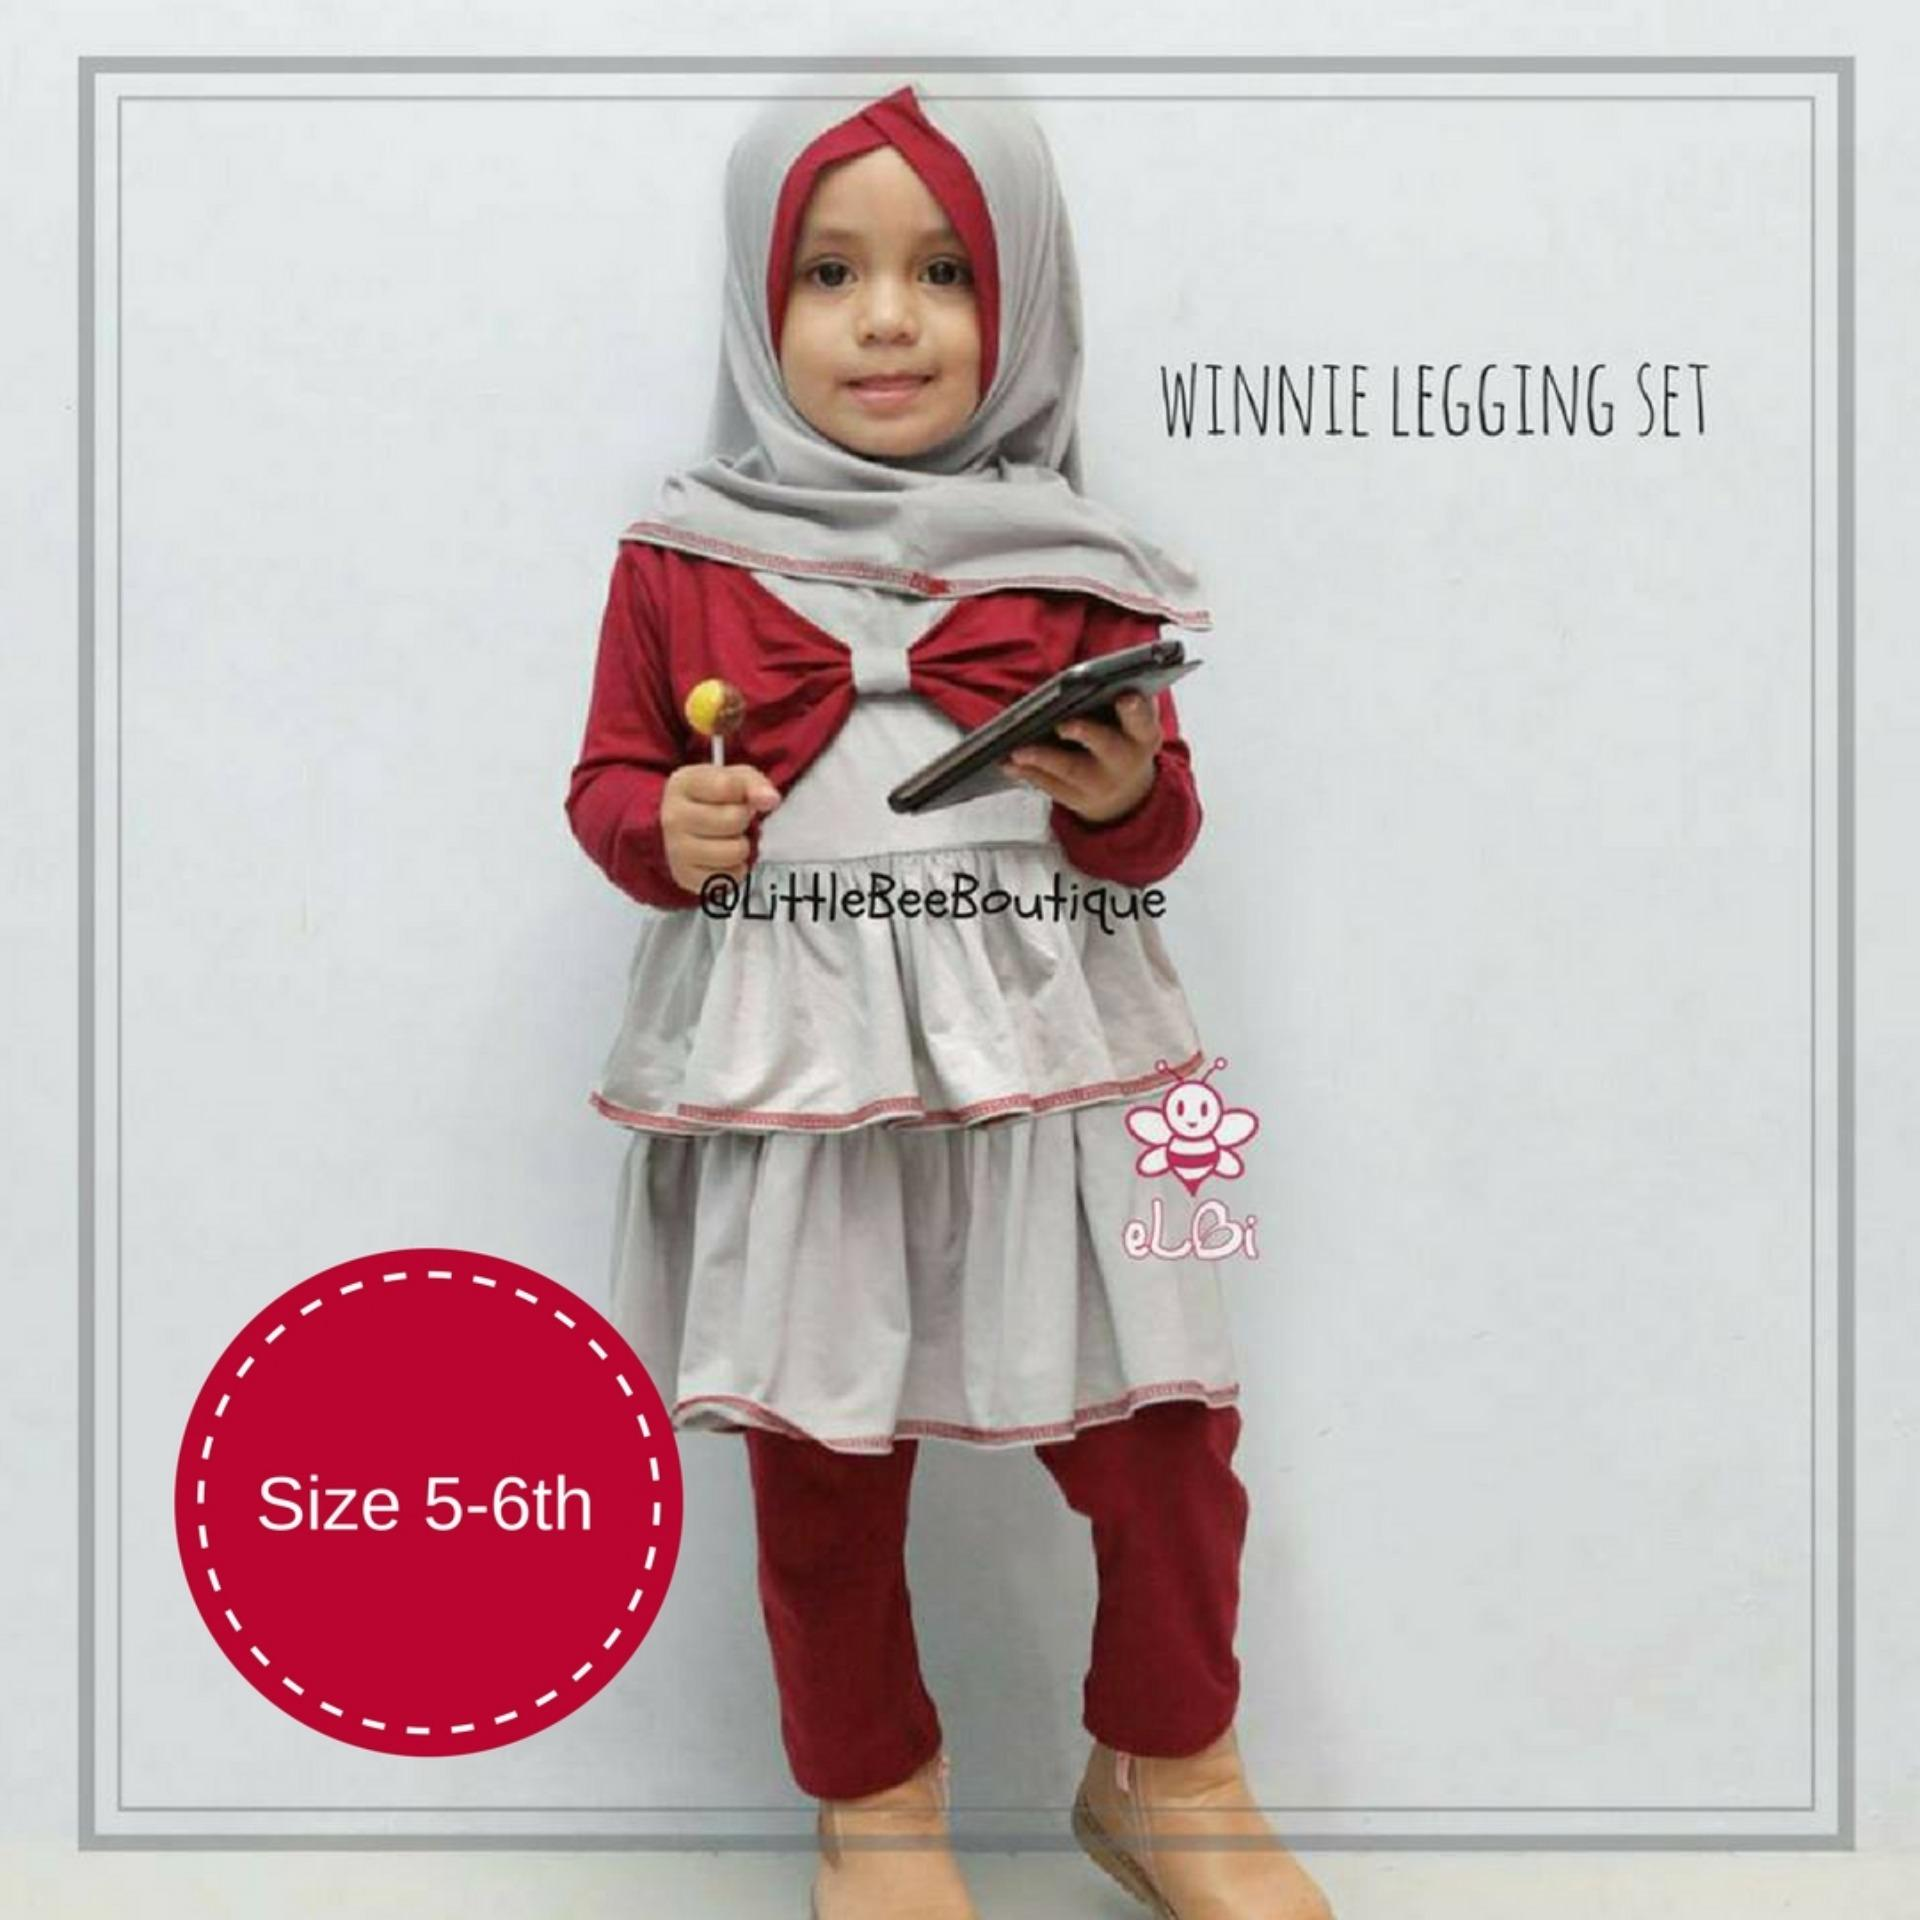 eLBi Winnie Legging Set / Baju Muslim Anak Balita / Pakaian Muslimah Bayi / Baju Bayi / Baju Muslim Bayi by Little Bee Boutique